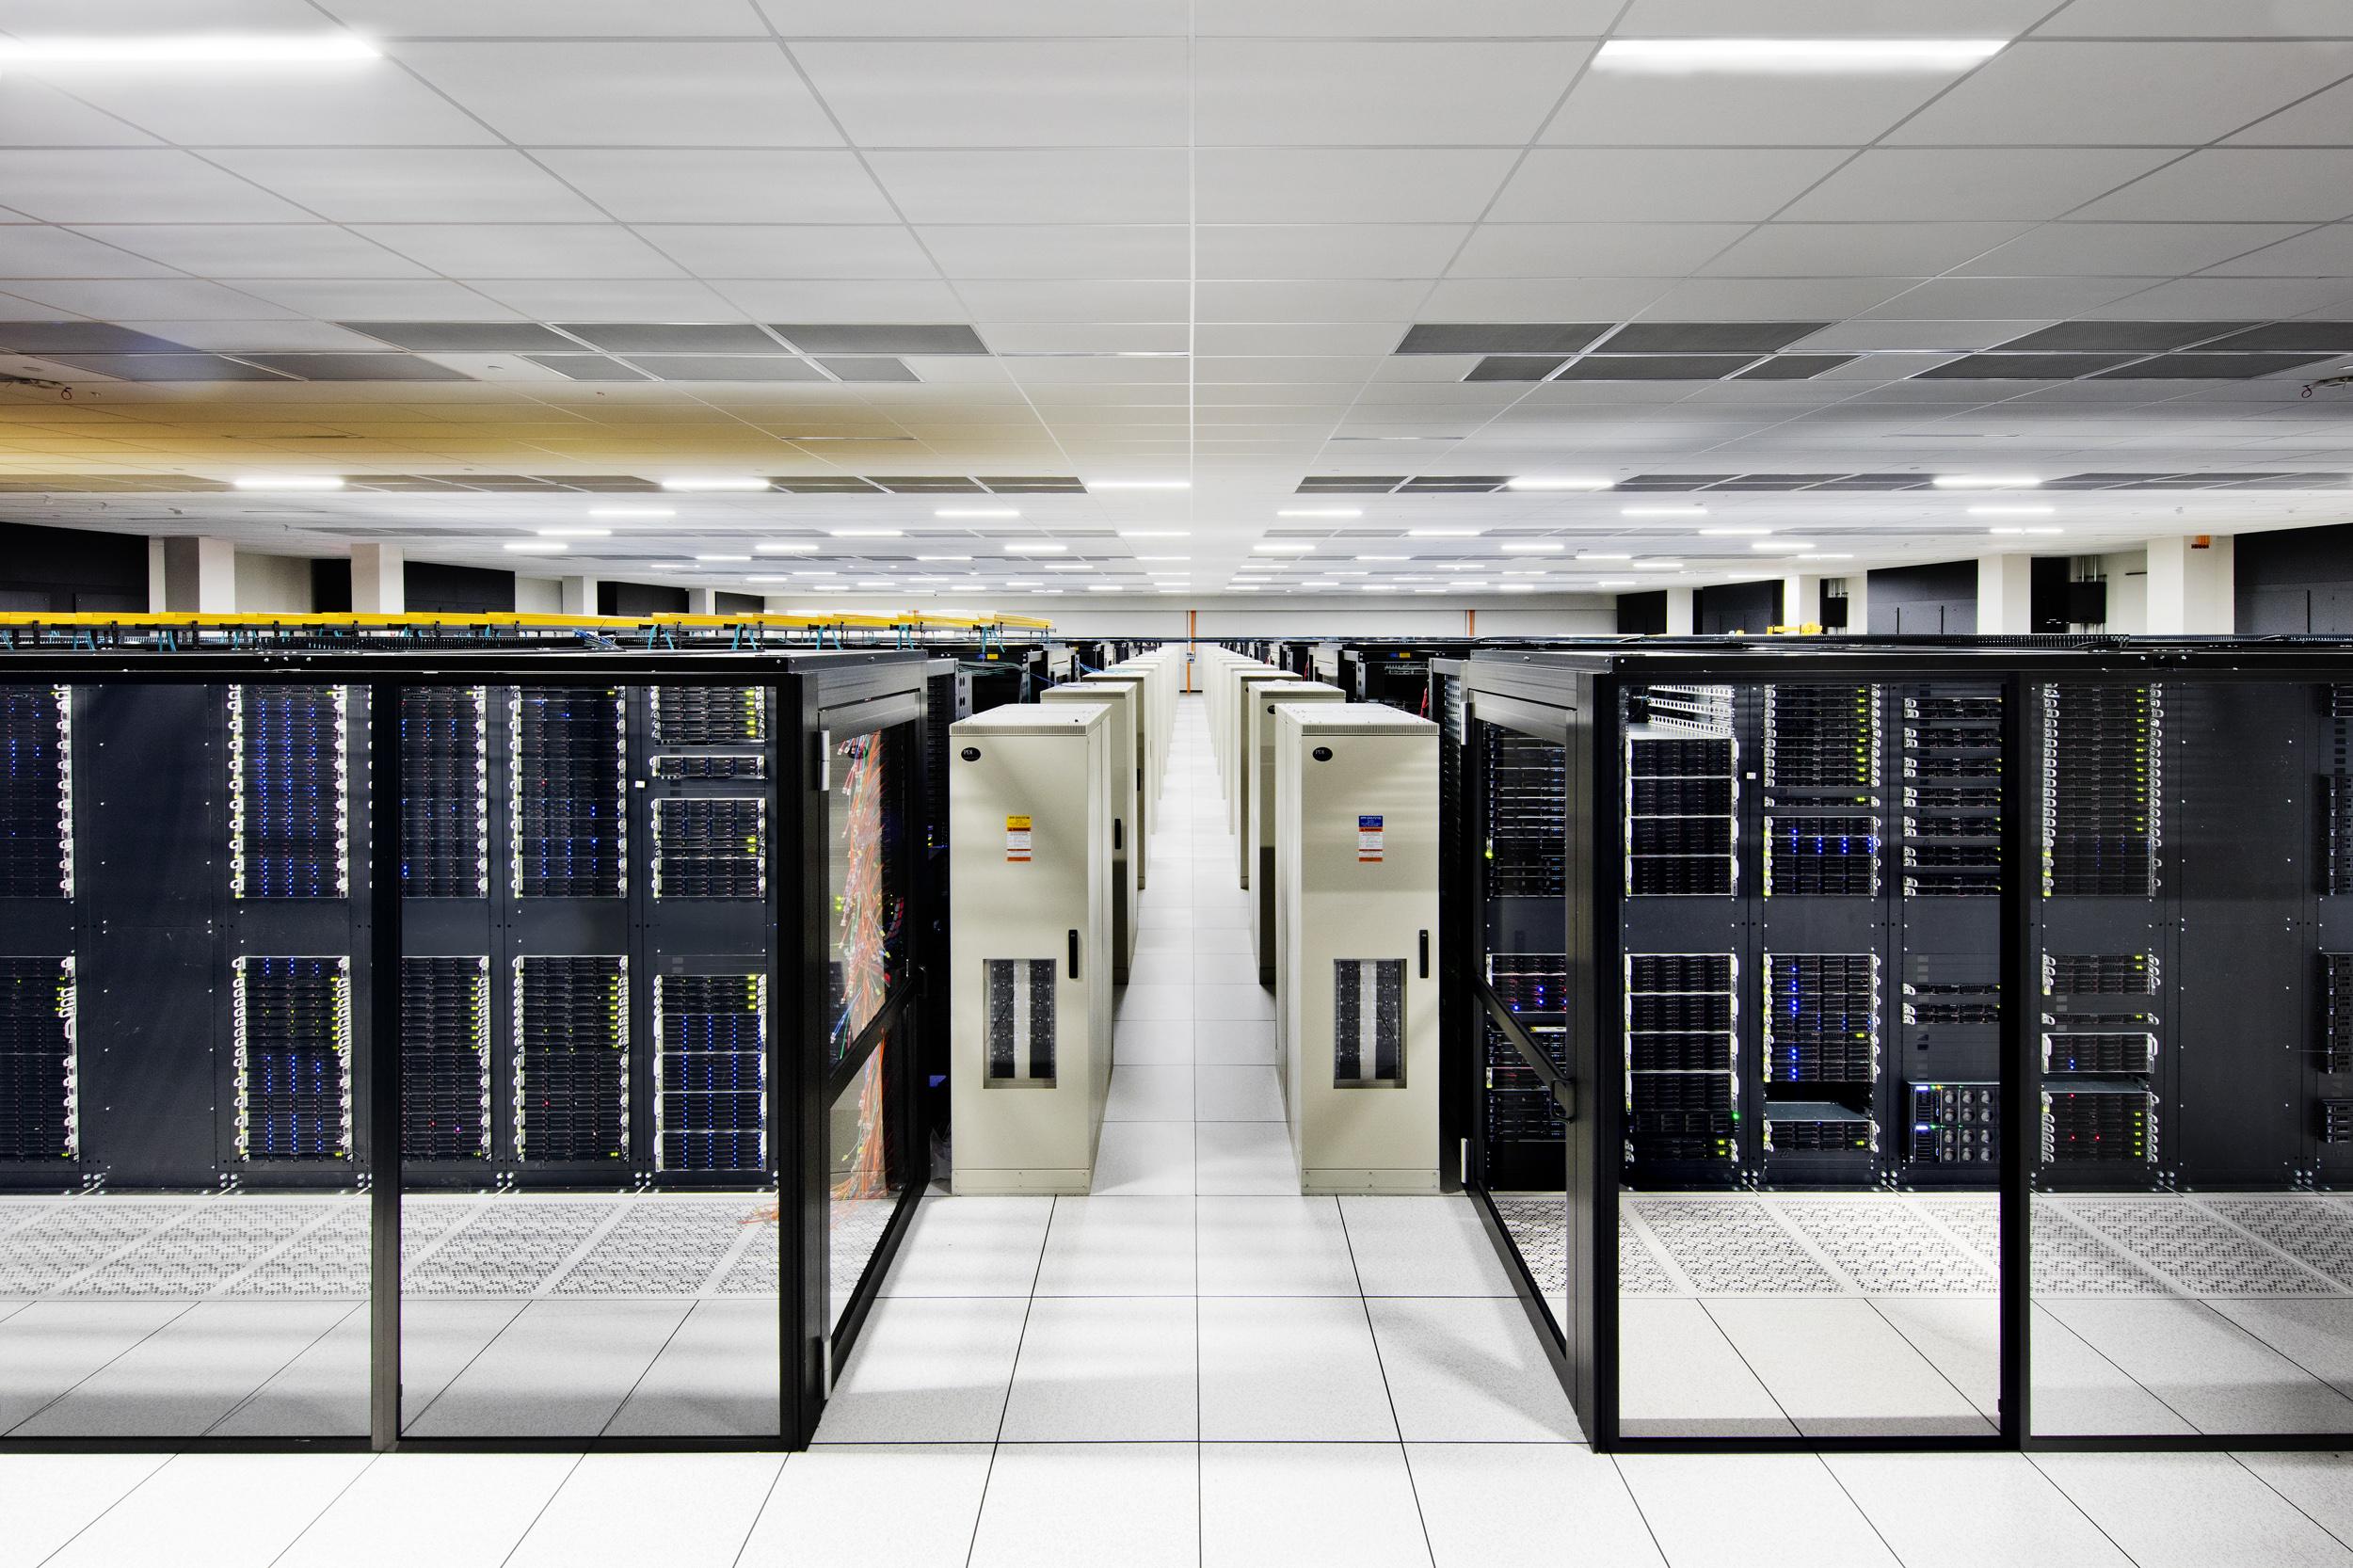 Room full of computer servers